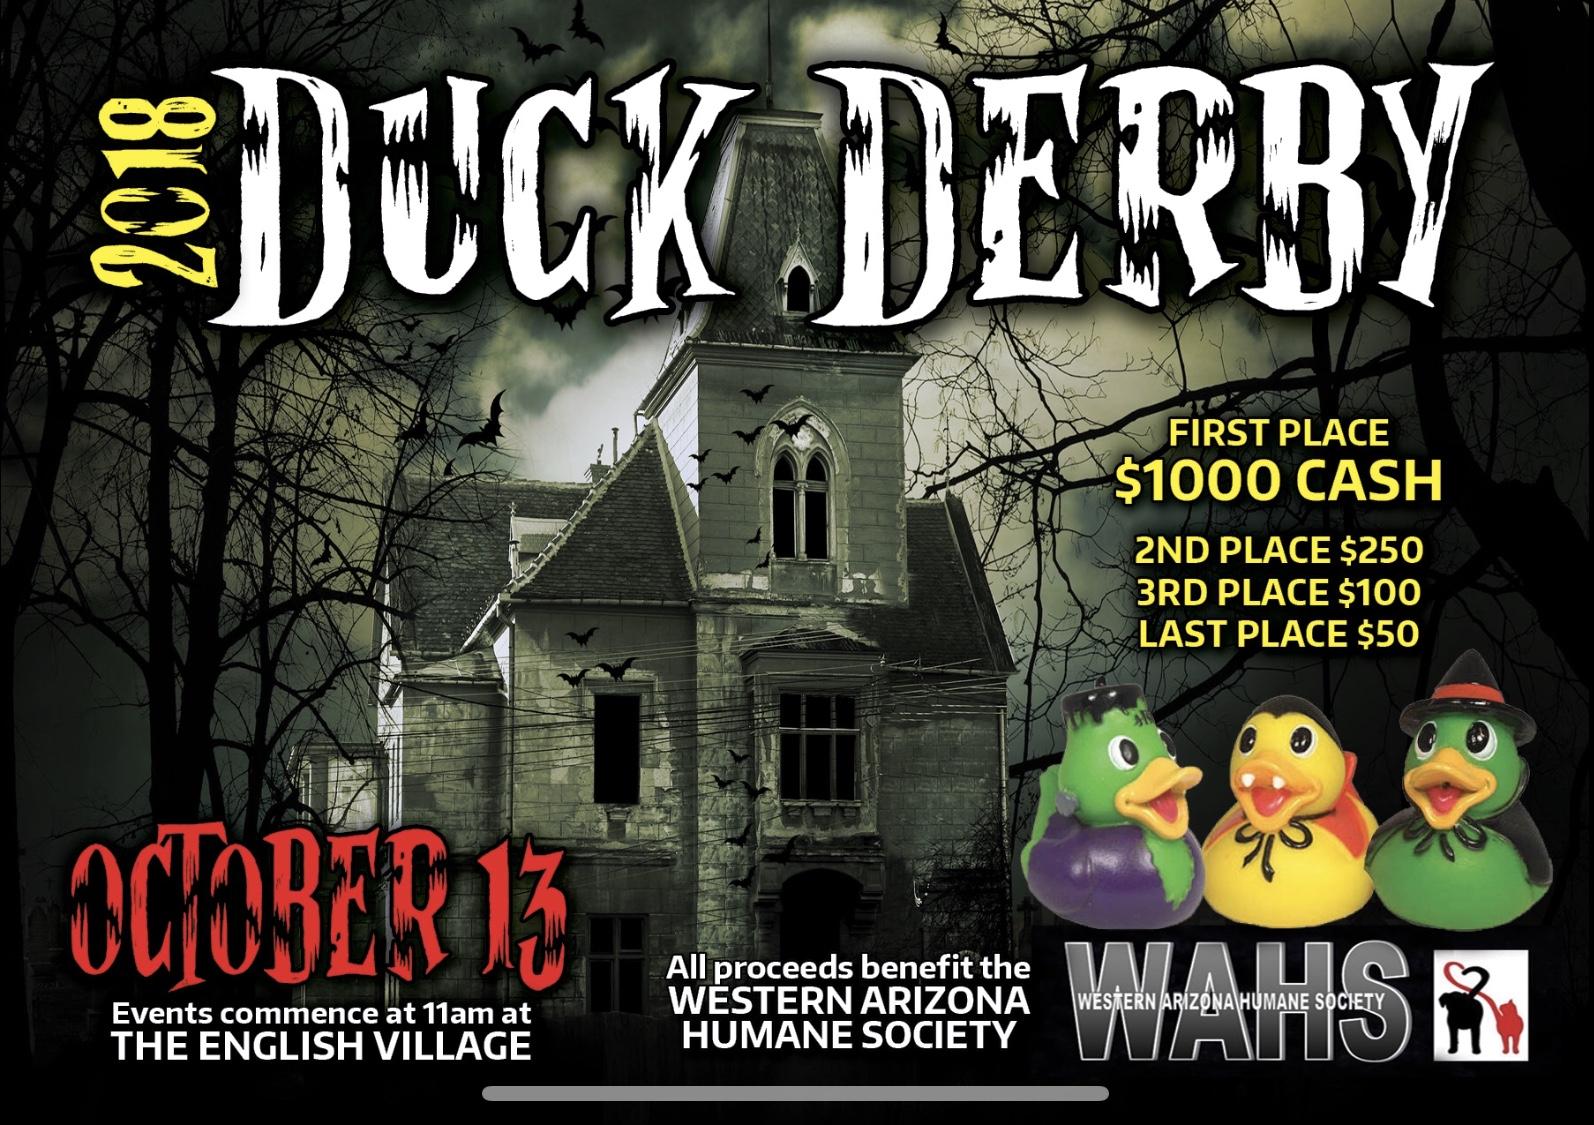 WAHS 2018 Duck Derby Races